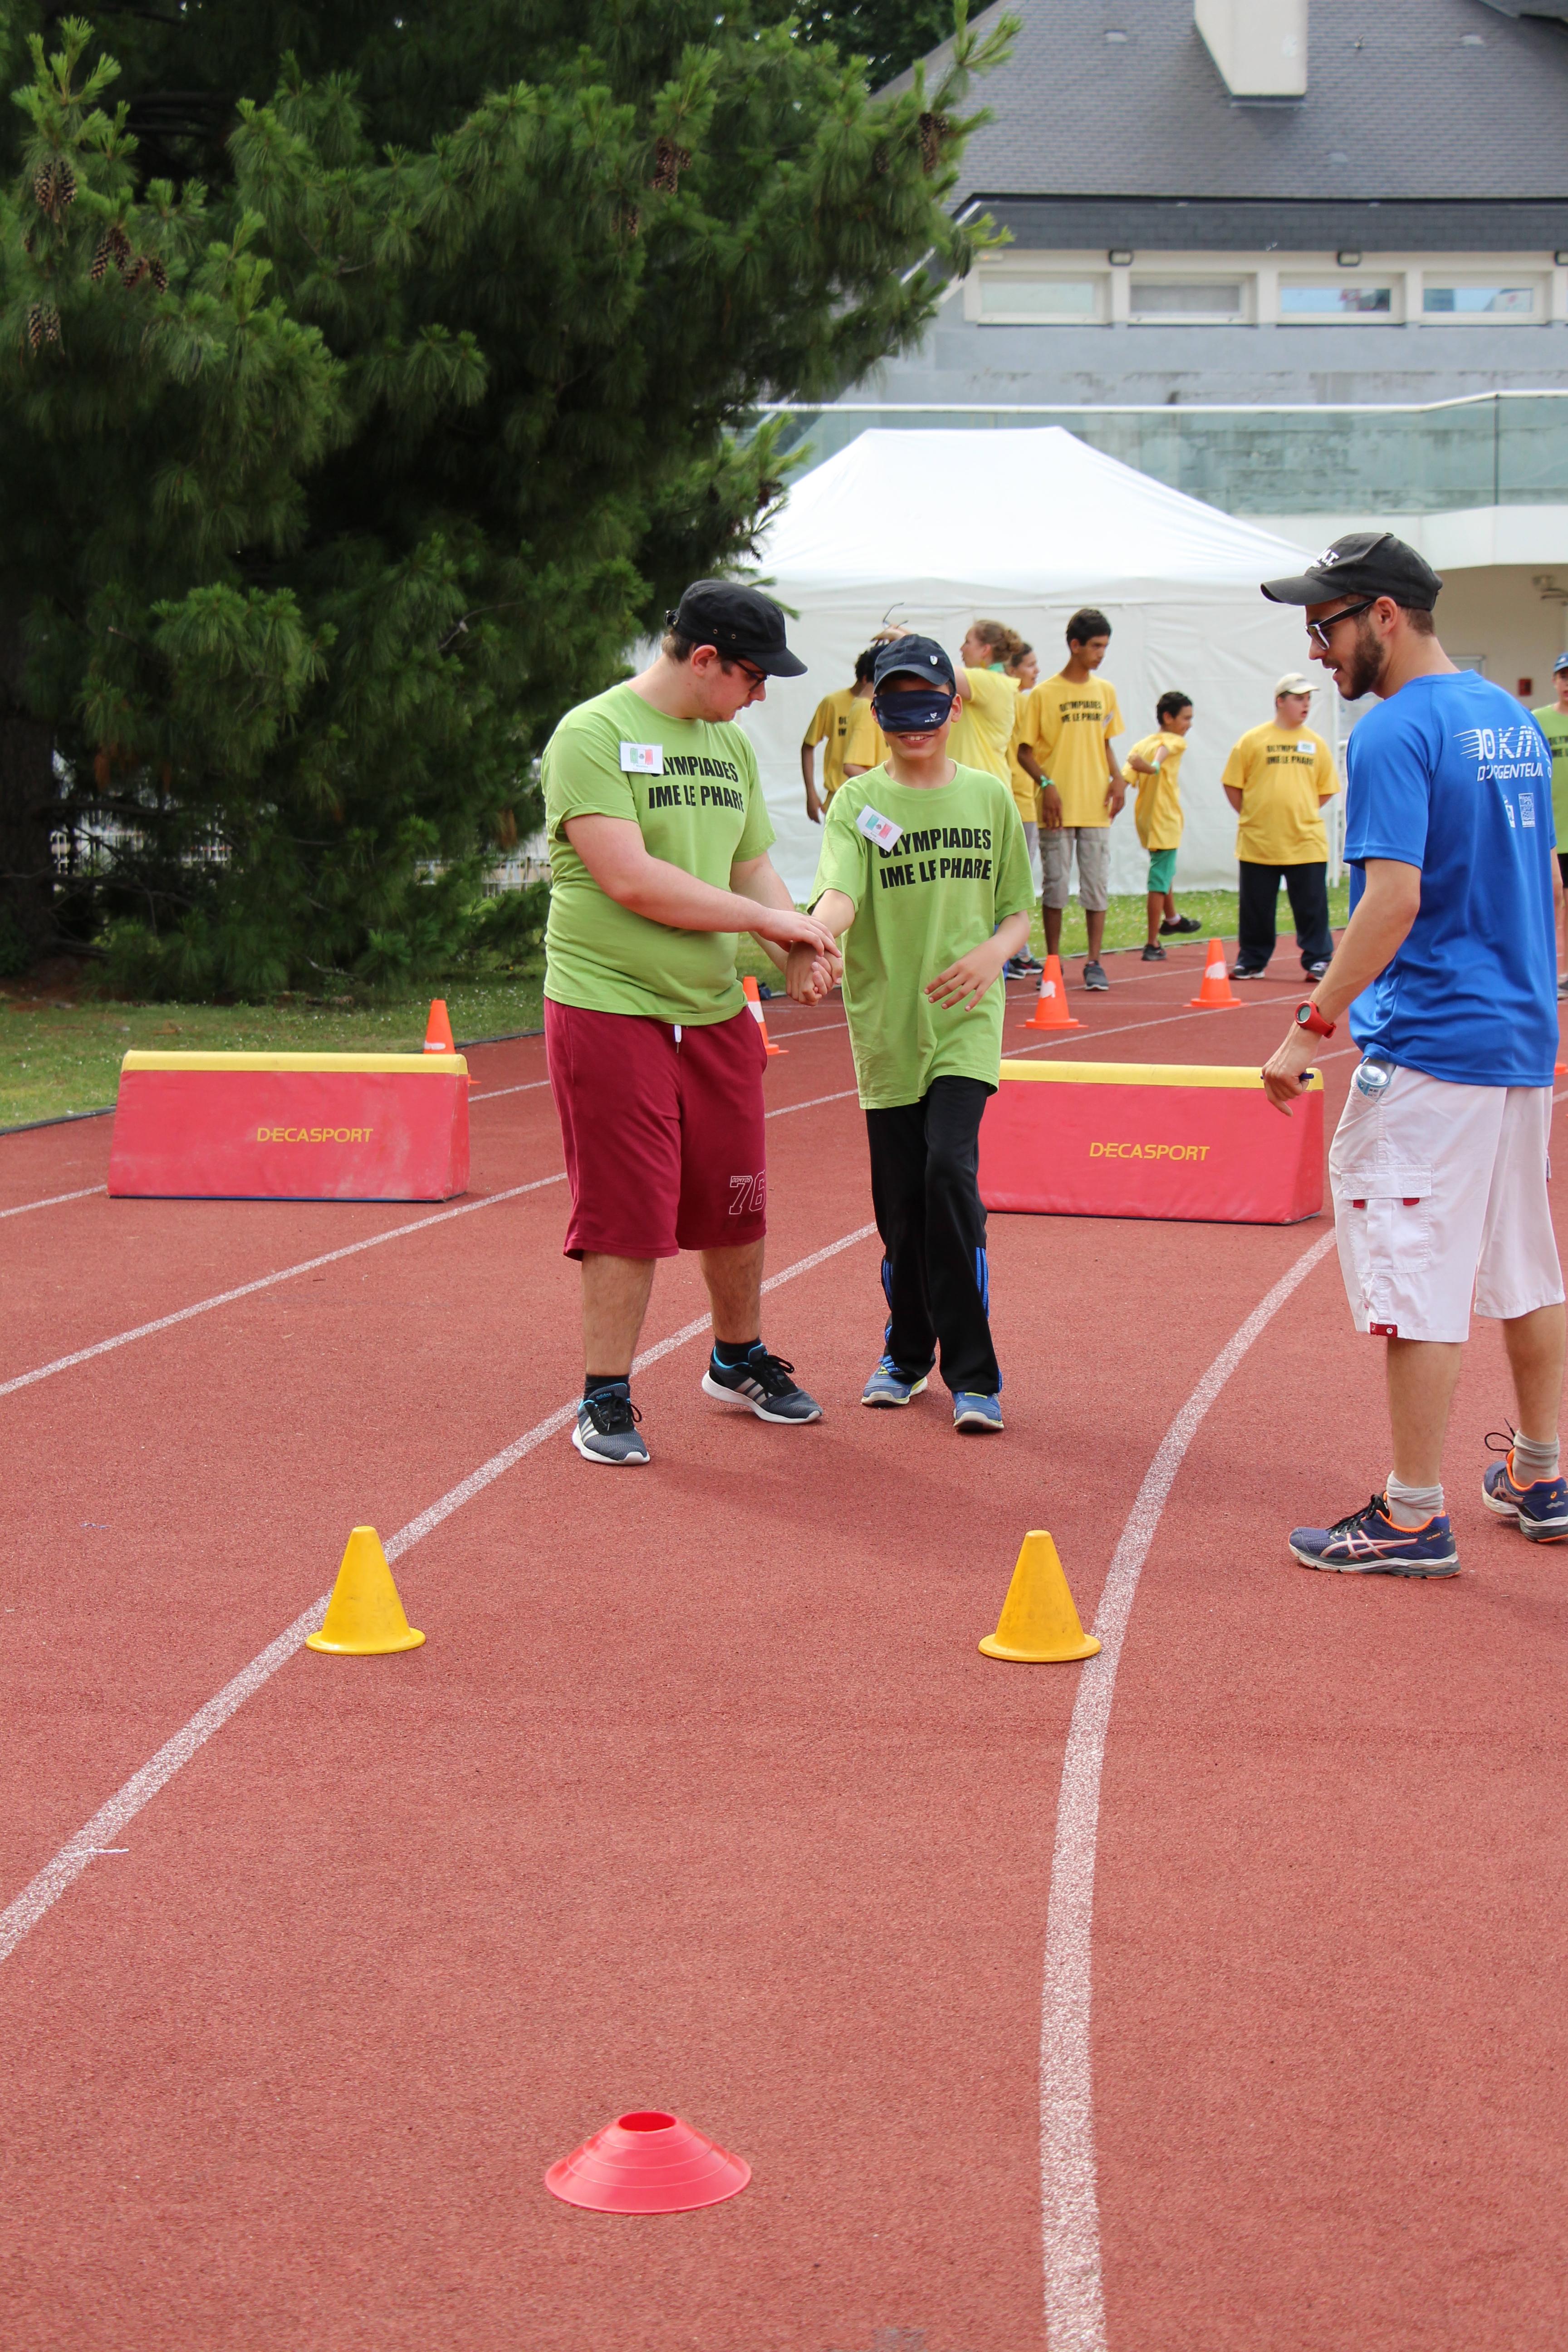 olympiades-association-actualites-jeunes-handicap-defi